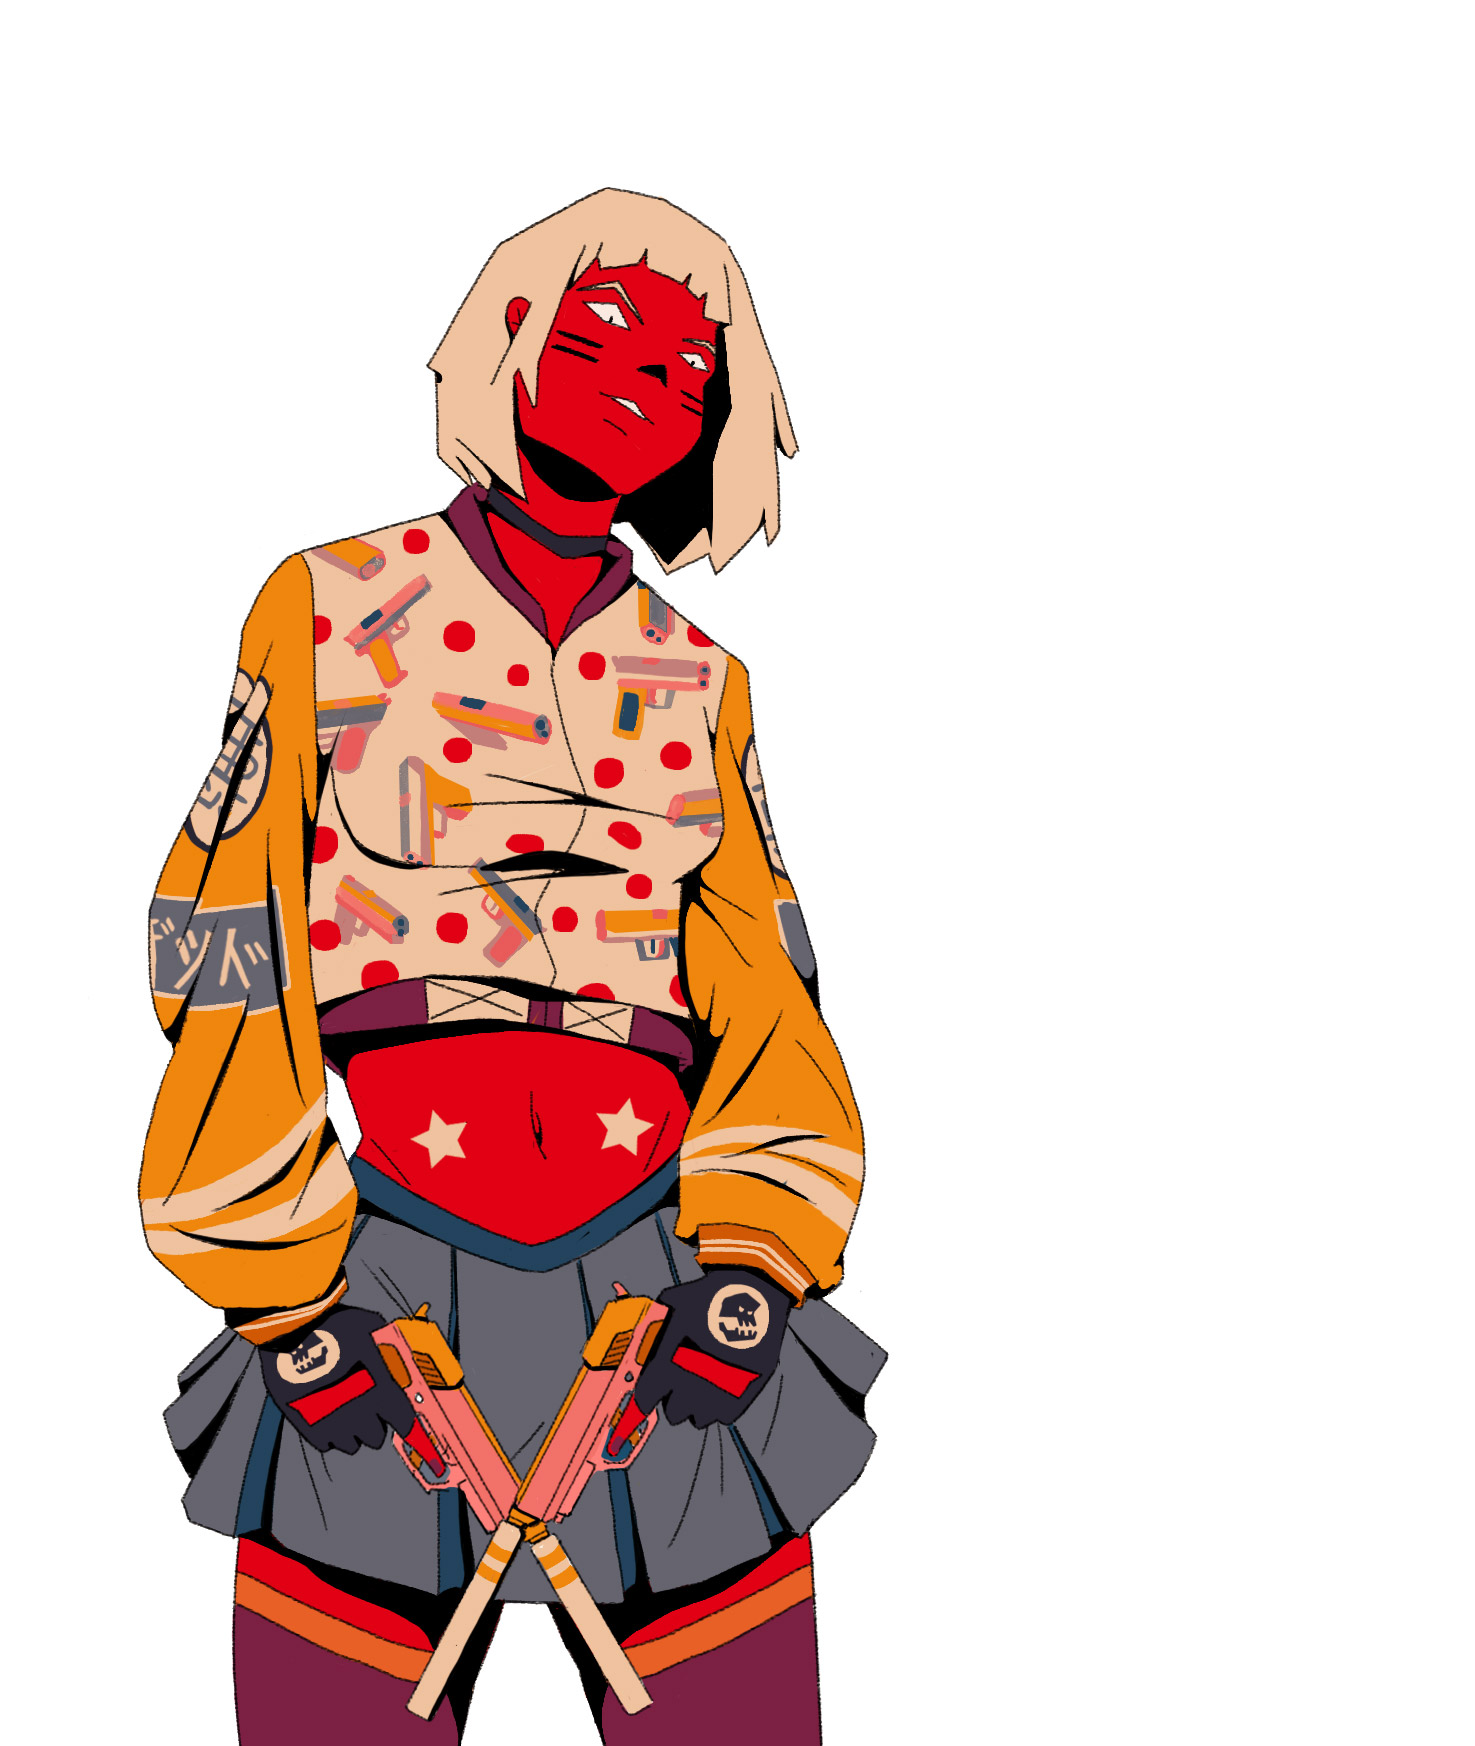 Gangster Wallpaper Girl Illustrator Spotlight Mau Lencinas Booooooom Create